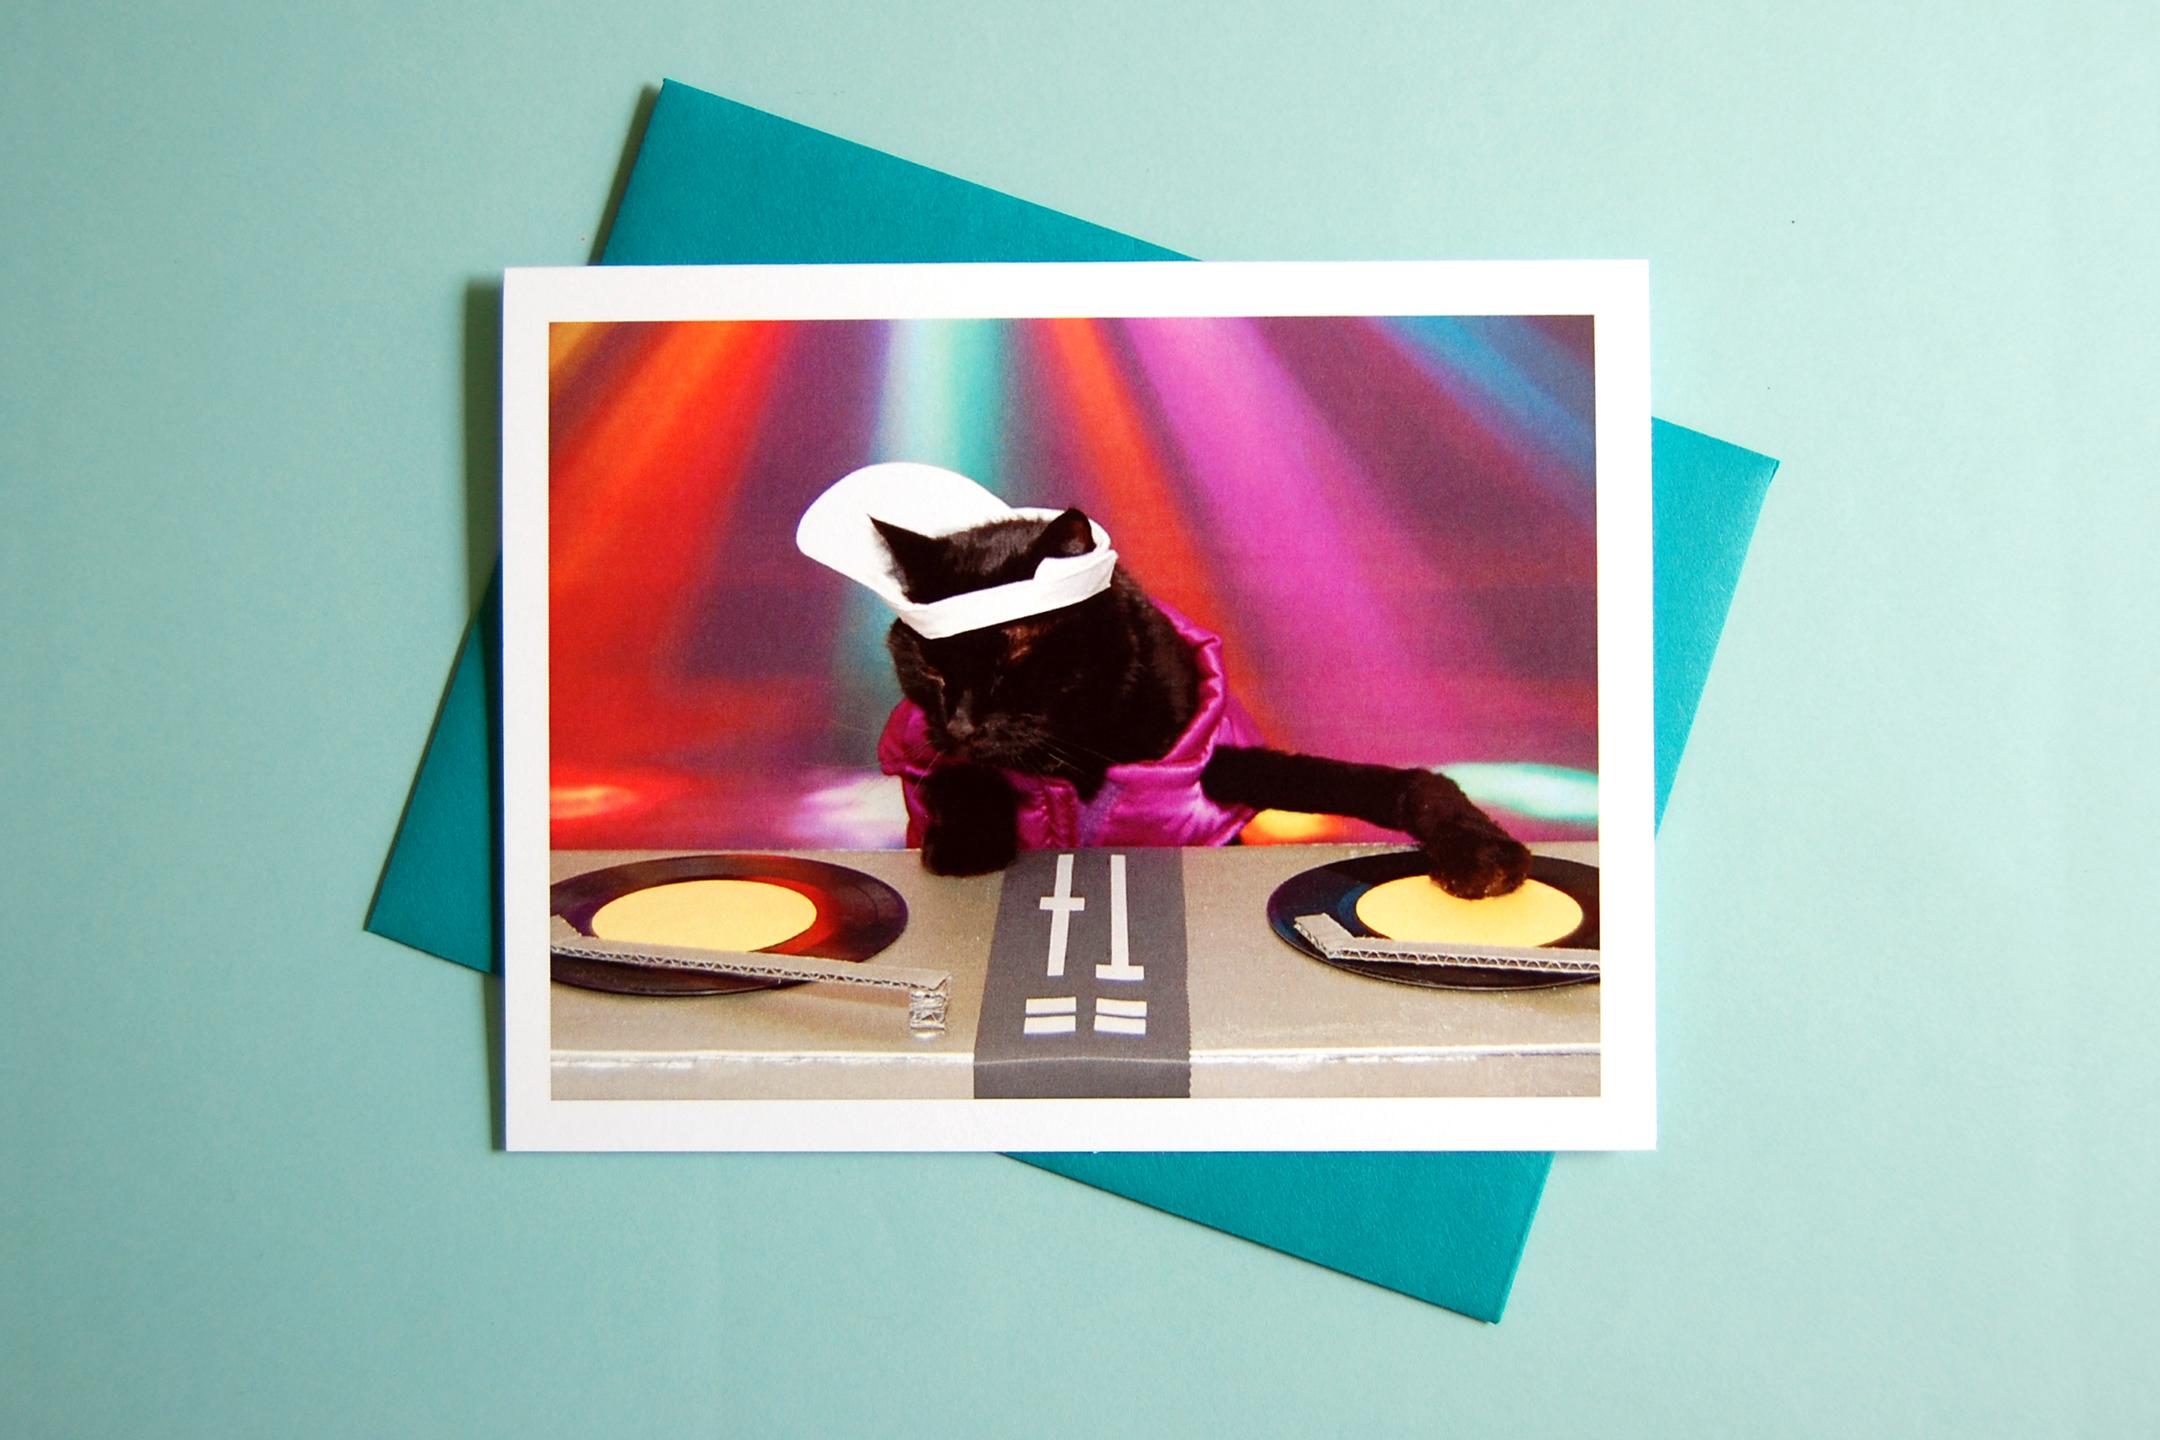 C41 AC is DJ Mad Catter.jpg